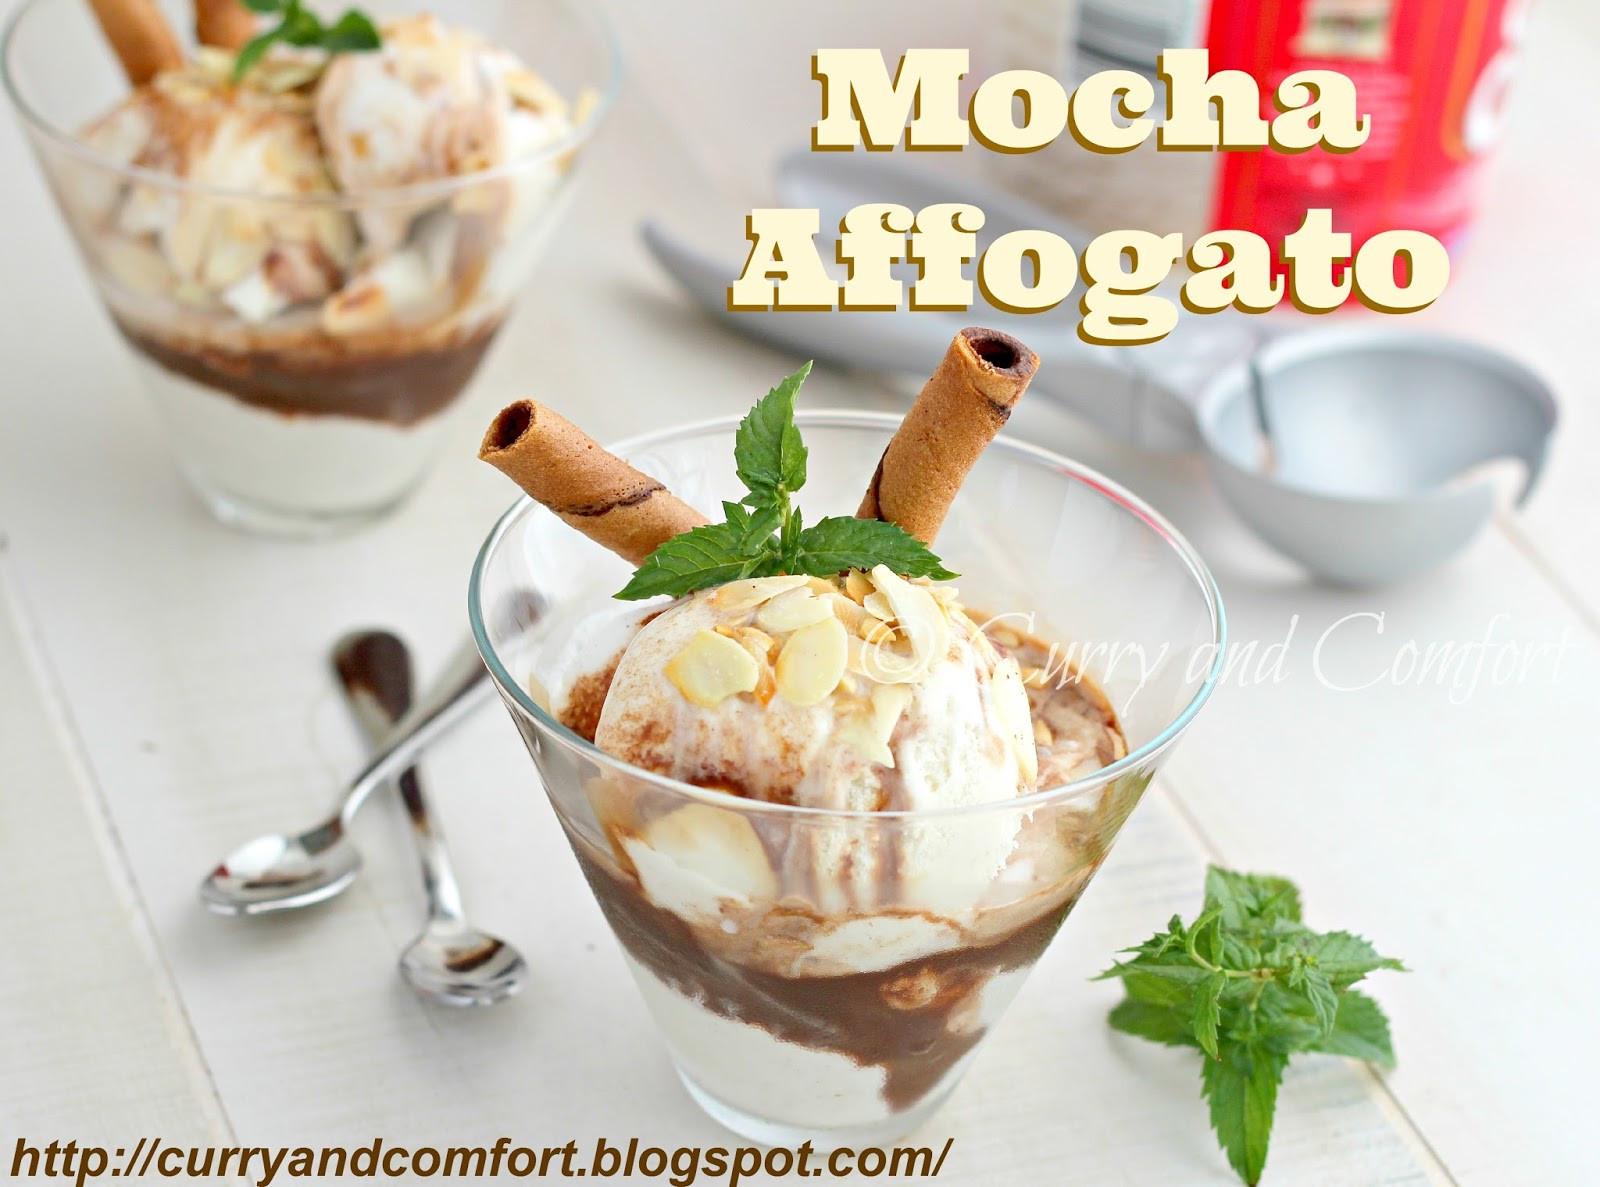 Italian Ice Cream Dessert  Kitchen Simmer Easy Mocha Affogato Italian Ice Cream